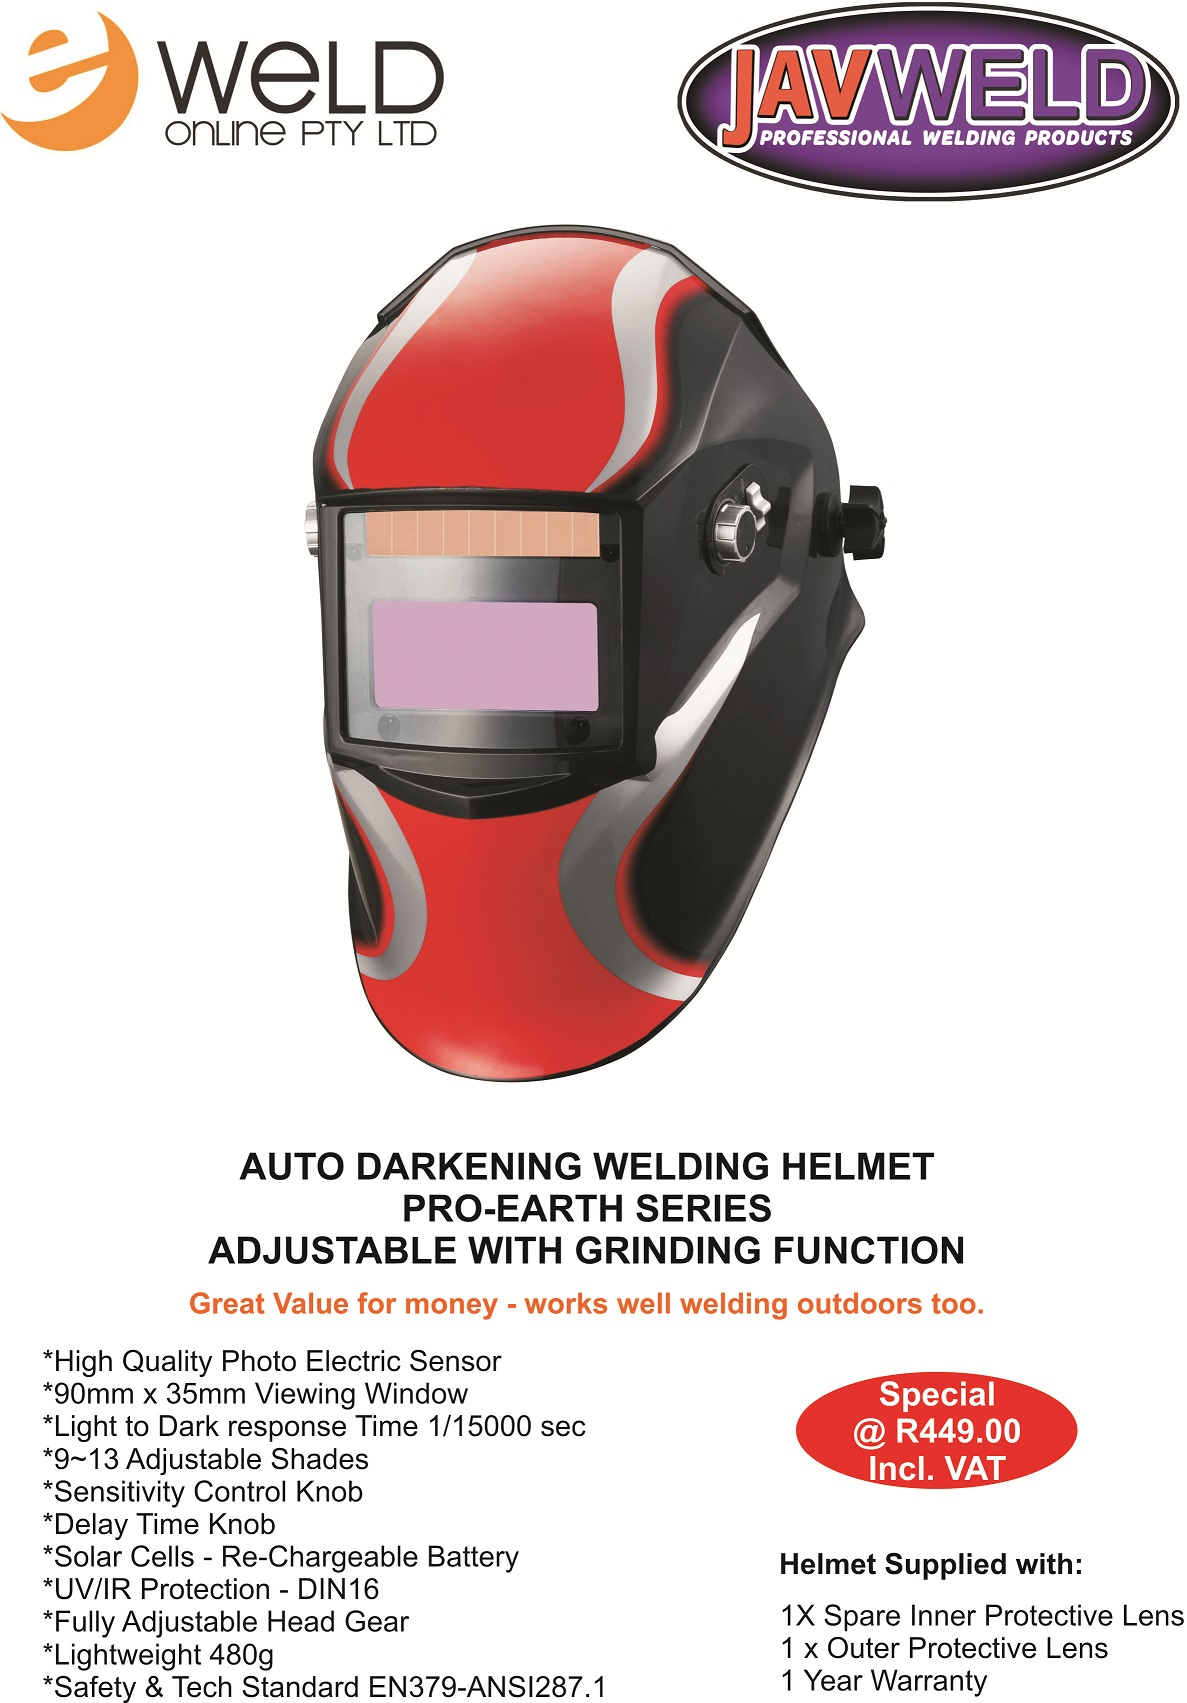 Earth Series Auto Darkening Helmet APRIL 2015